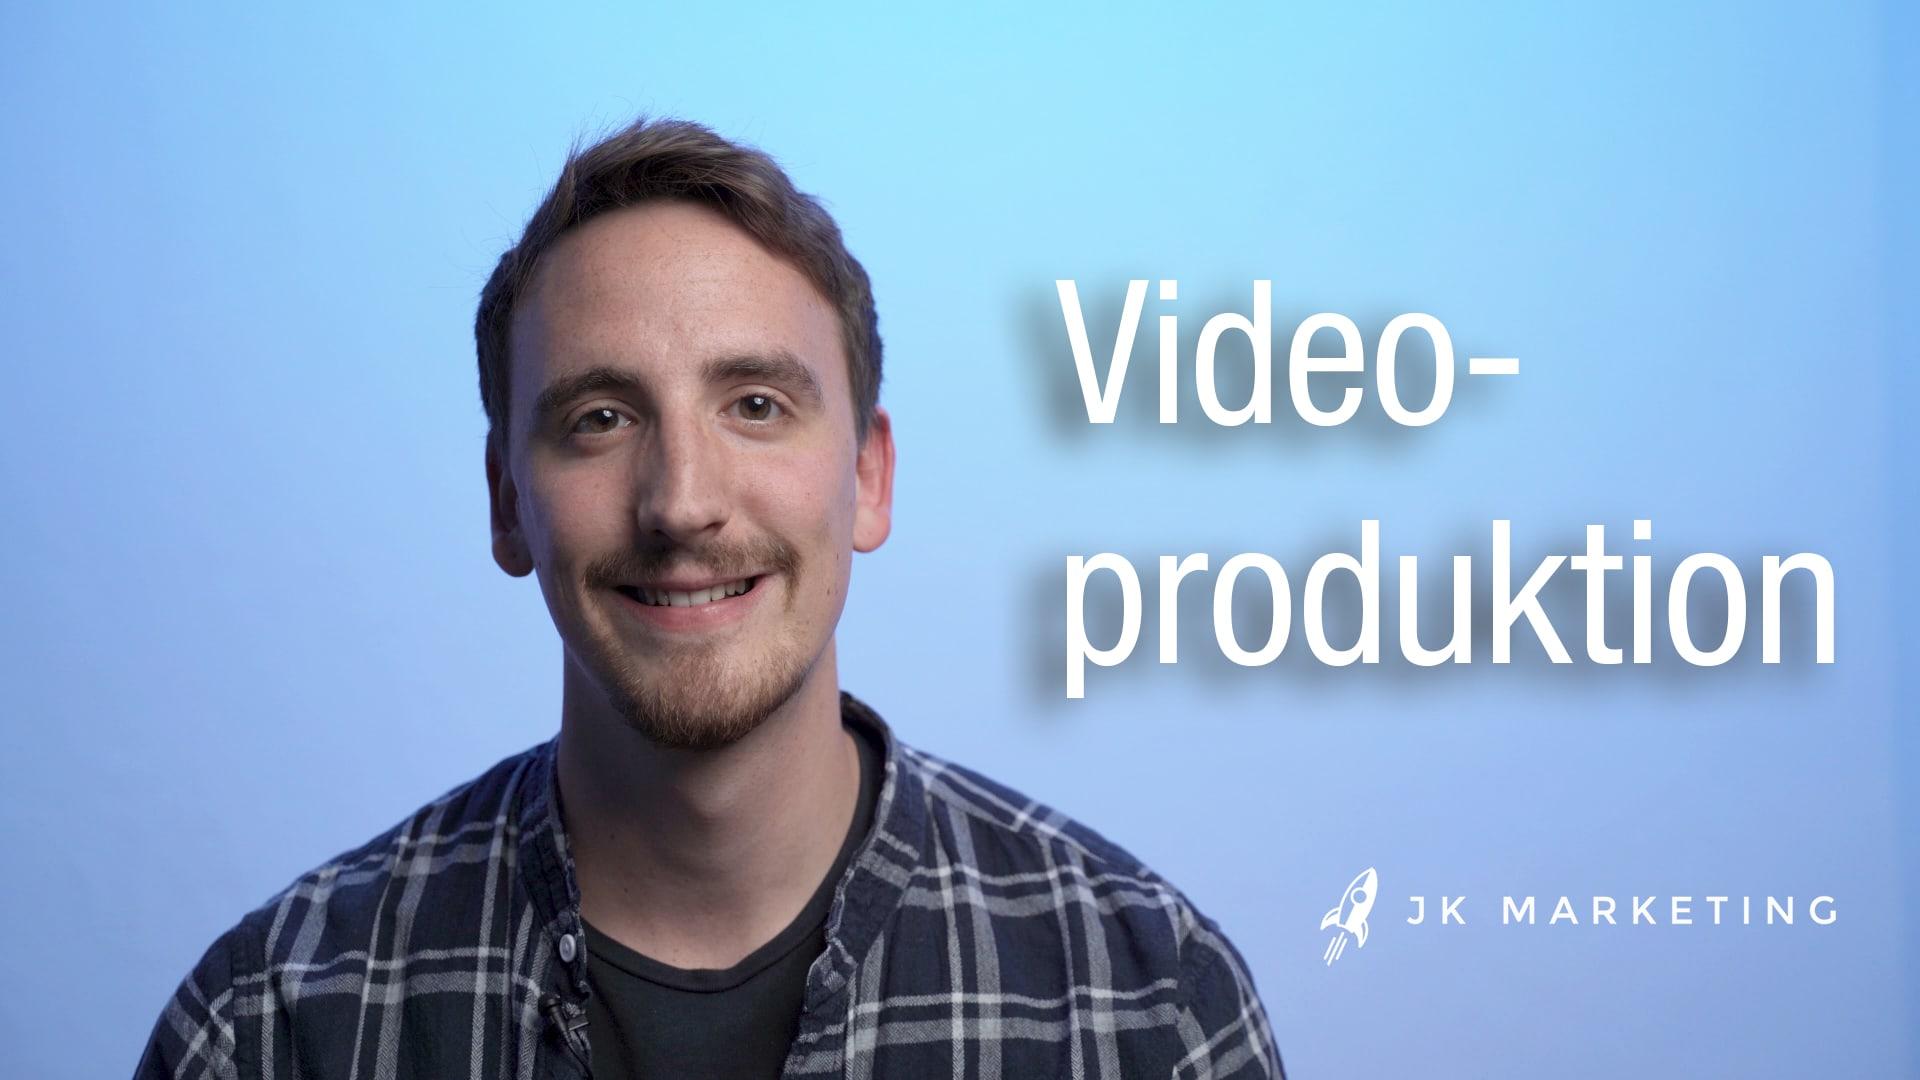 Thumbnail Videoproduktionen für den Rems-Murr-Kreis: Backnang, Winnenden, Waiblingen Fellbach Schorndorf von JK Marketing